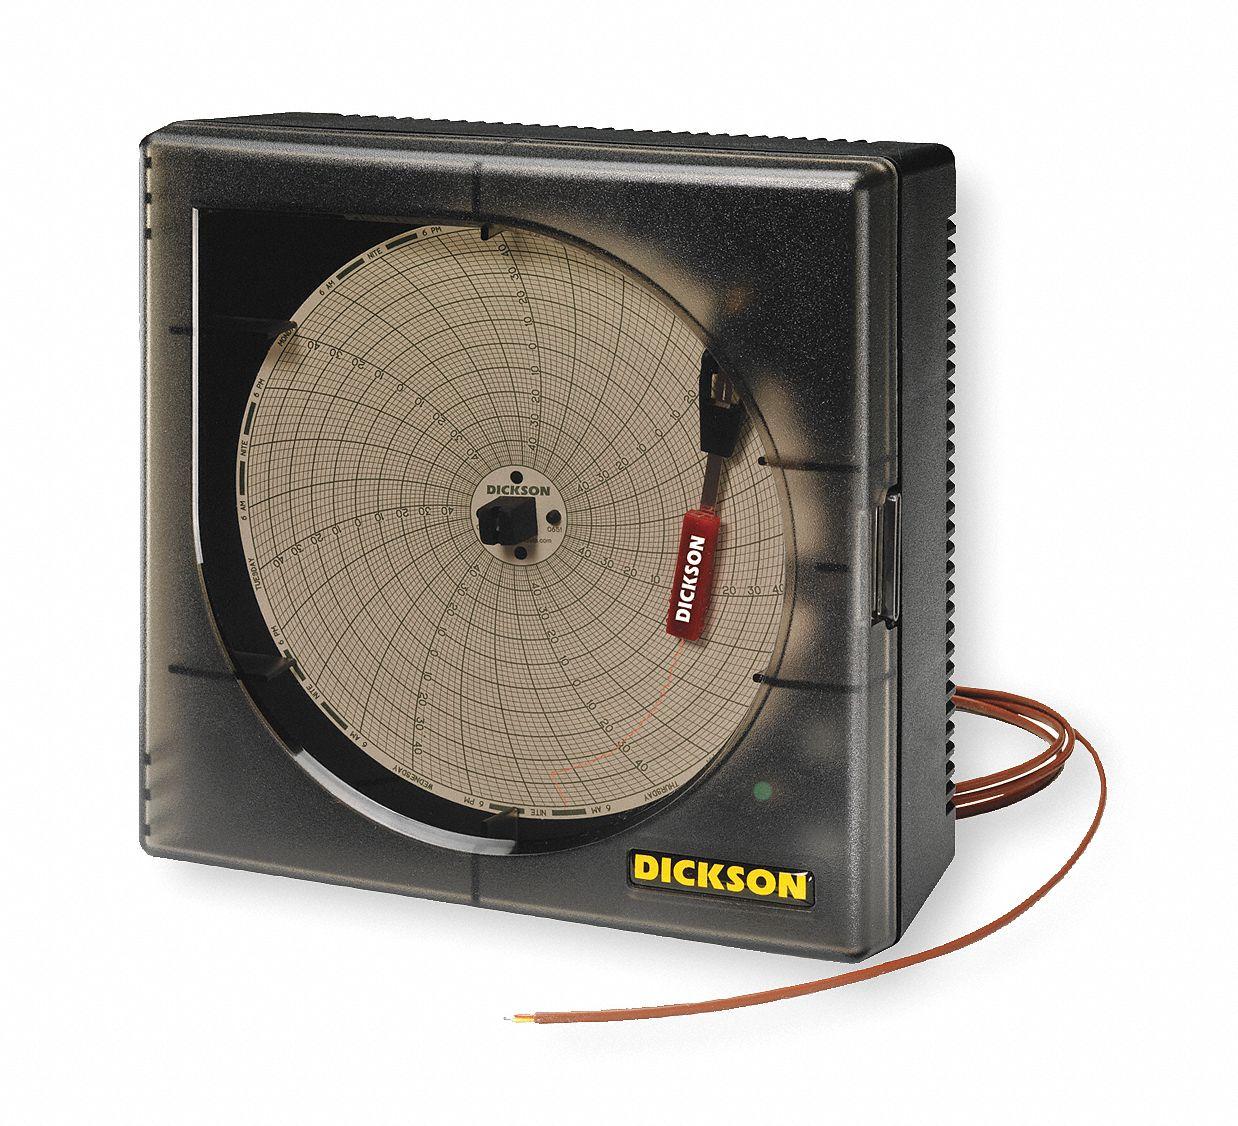 4 20ma Digital Chart Recorder : Dickson circular chart recorder temperature in nfh